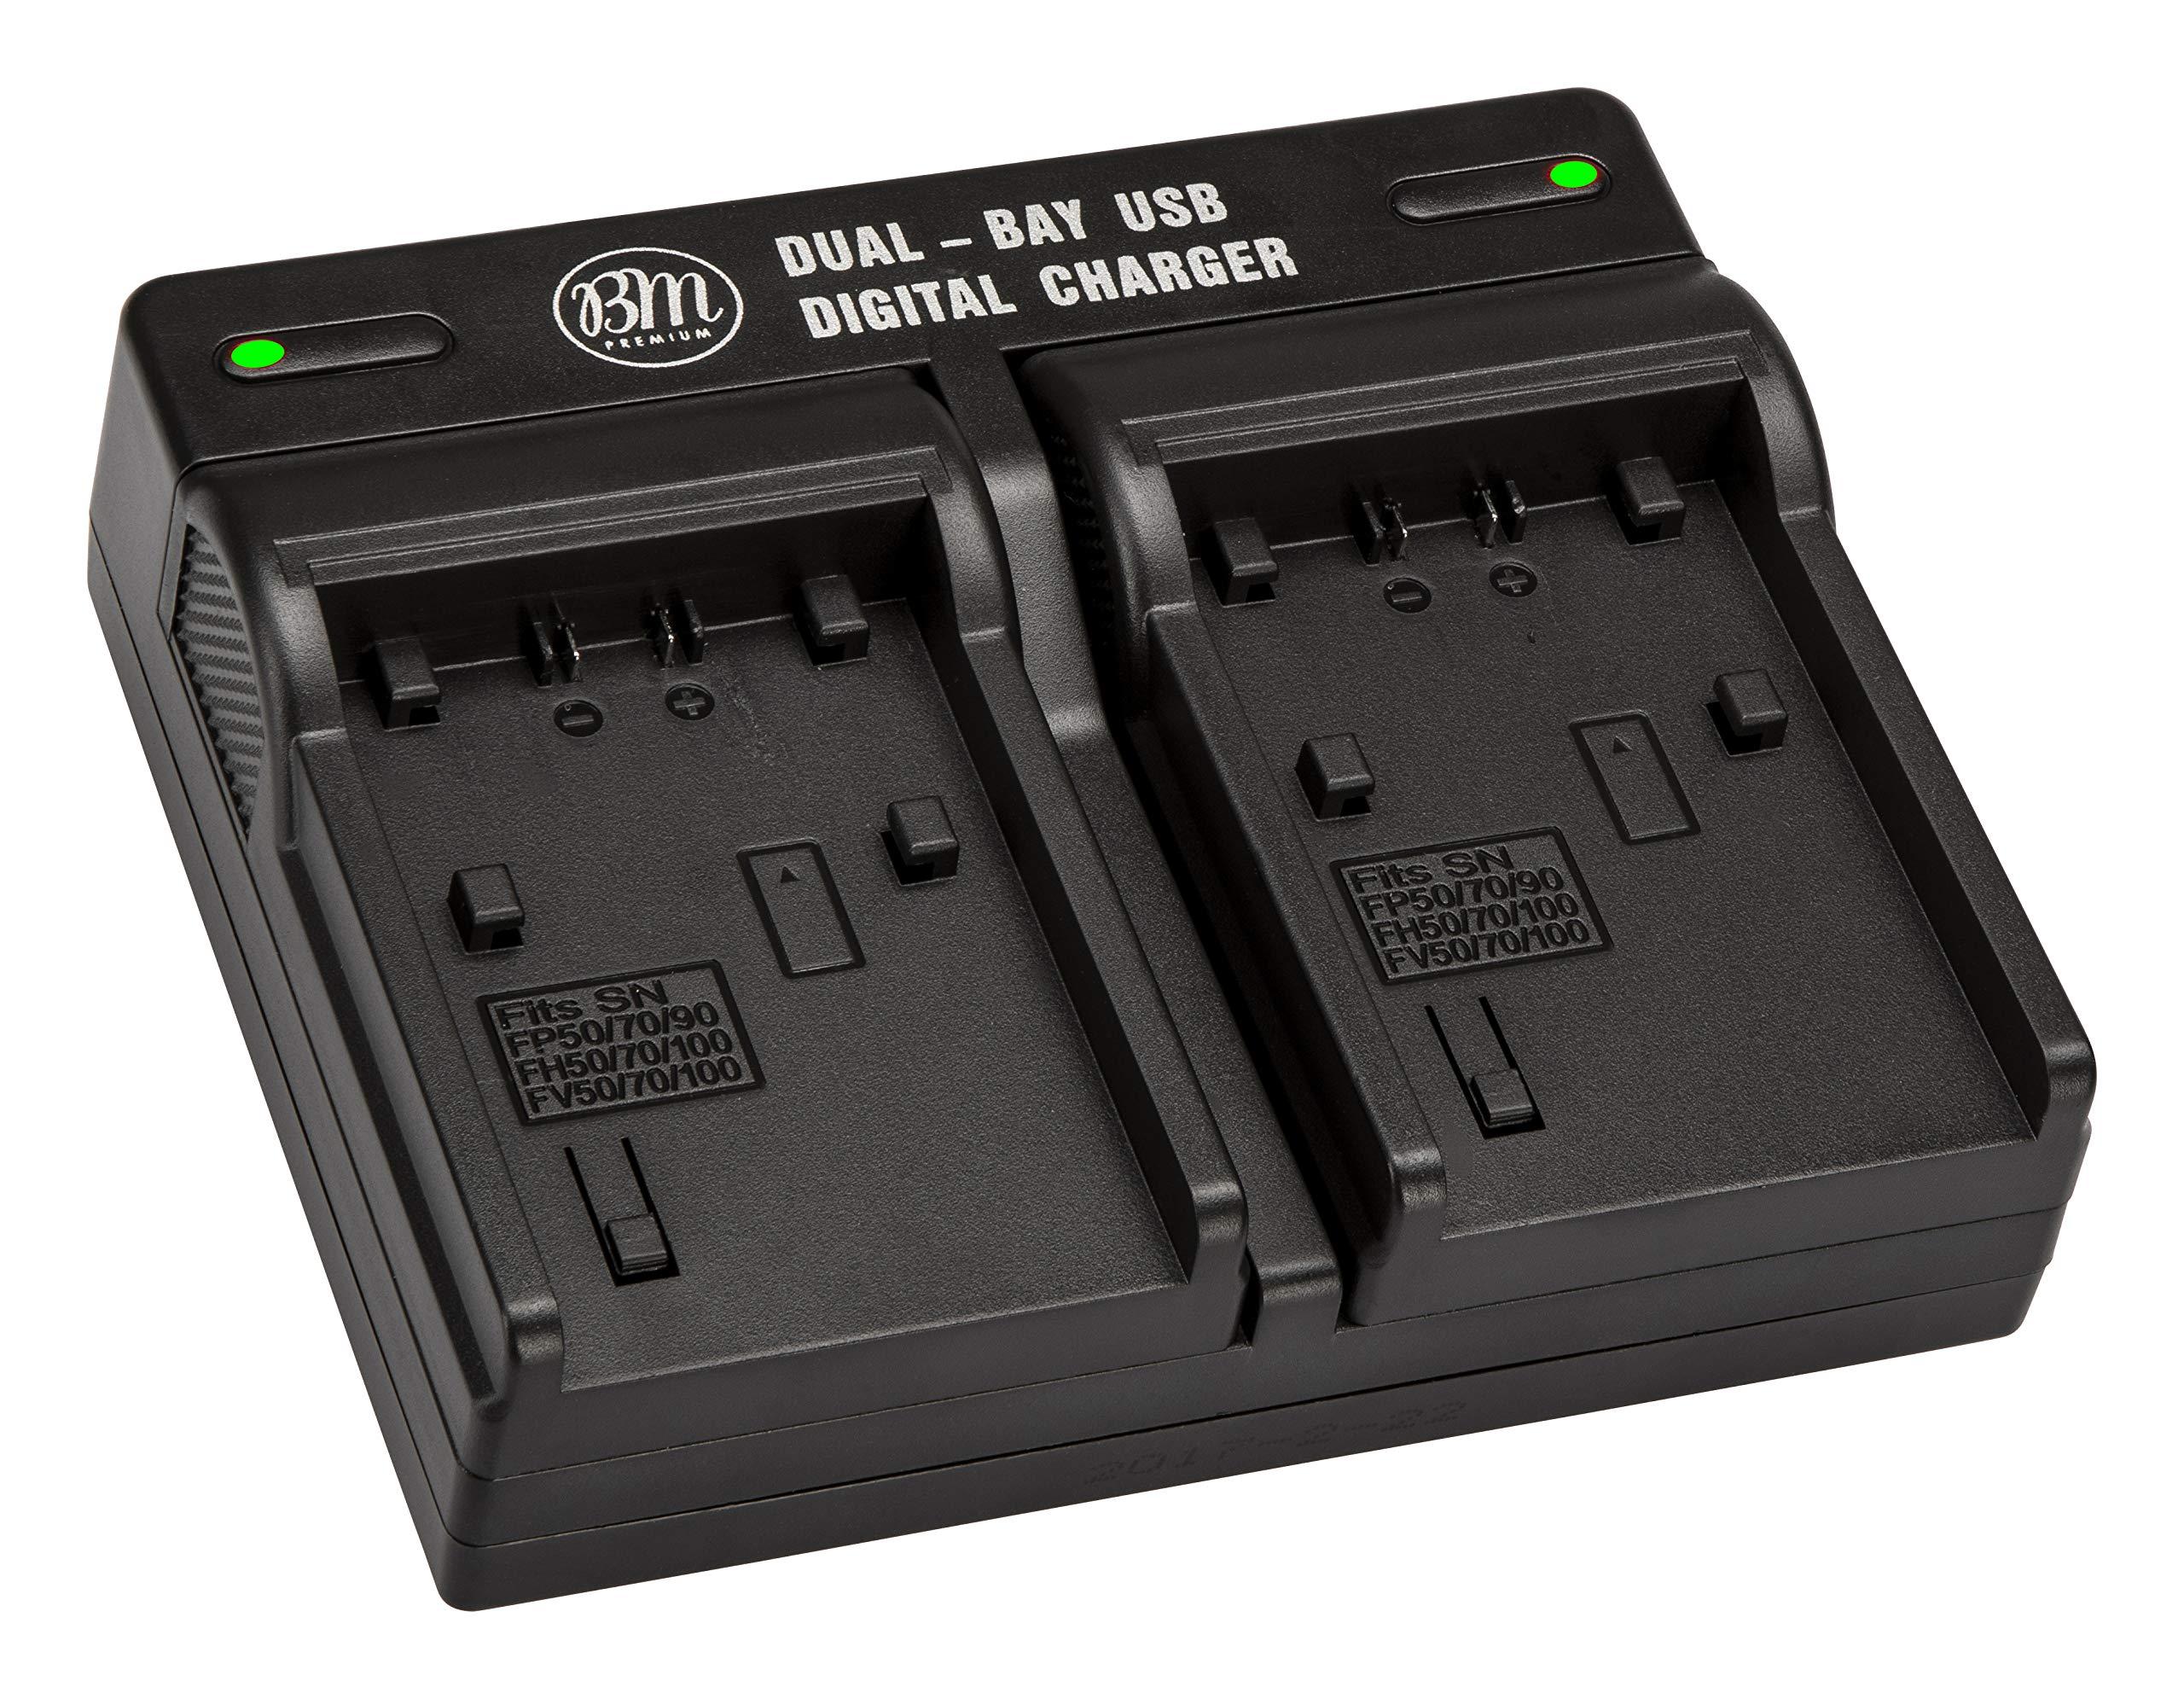 BM Premium NPFH50 Dual Battery Charger for Sony CyberShot DSC-HX100V, DSC-HX1, HDR-TG5V, DSCHX200V, Alpha DSLRA230, DSLRA290, DSLRA330, DSLRA380, DSLRA390 Digital Camera